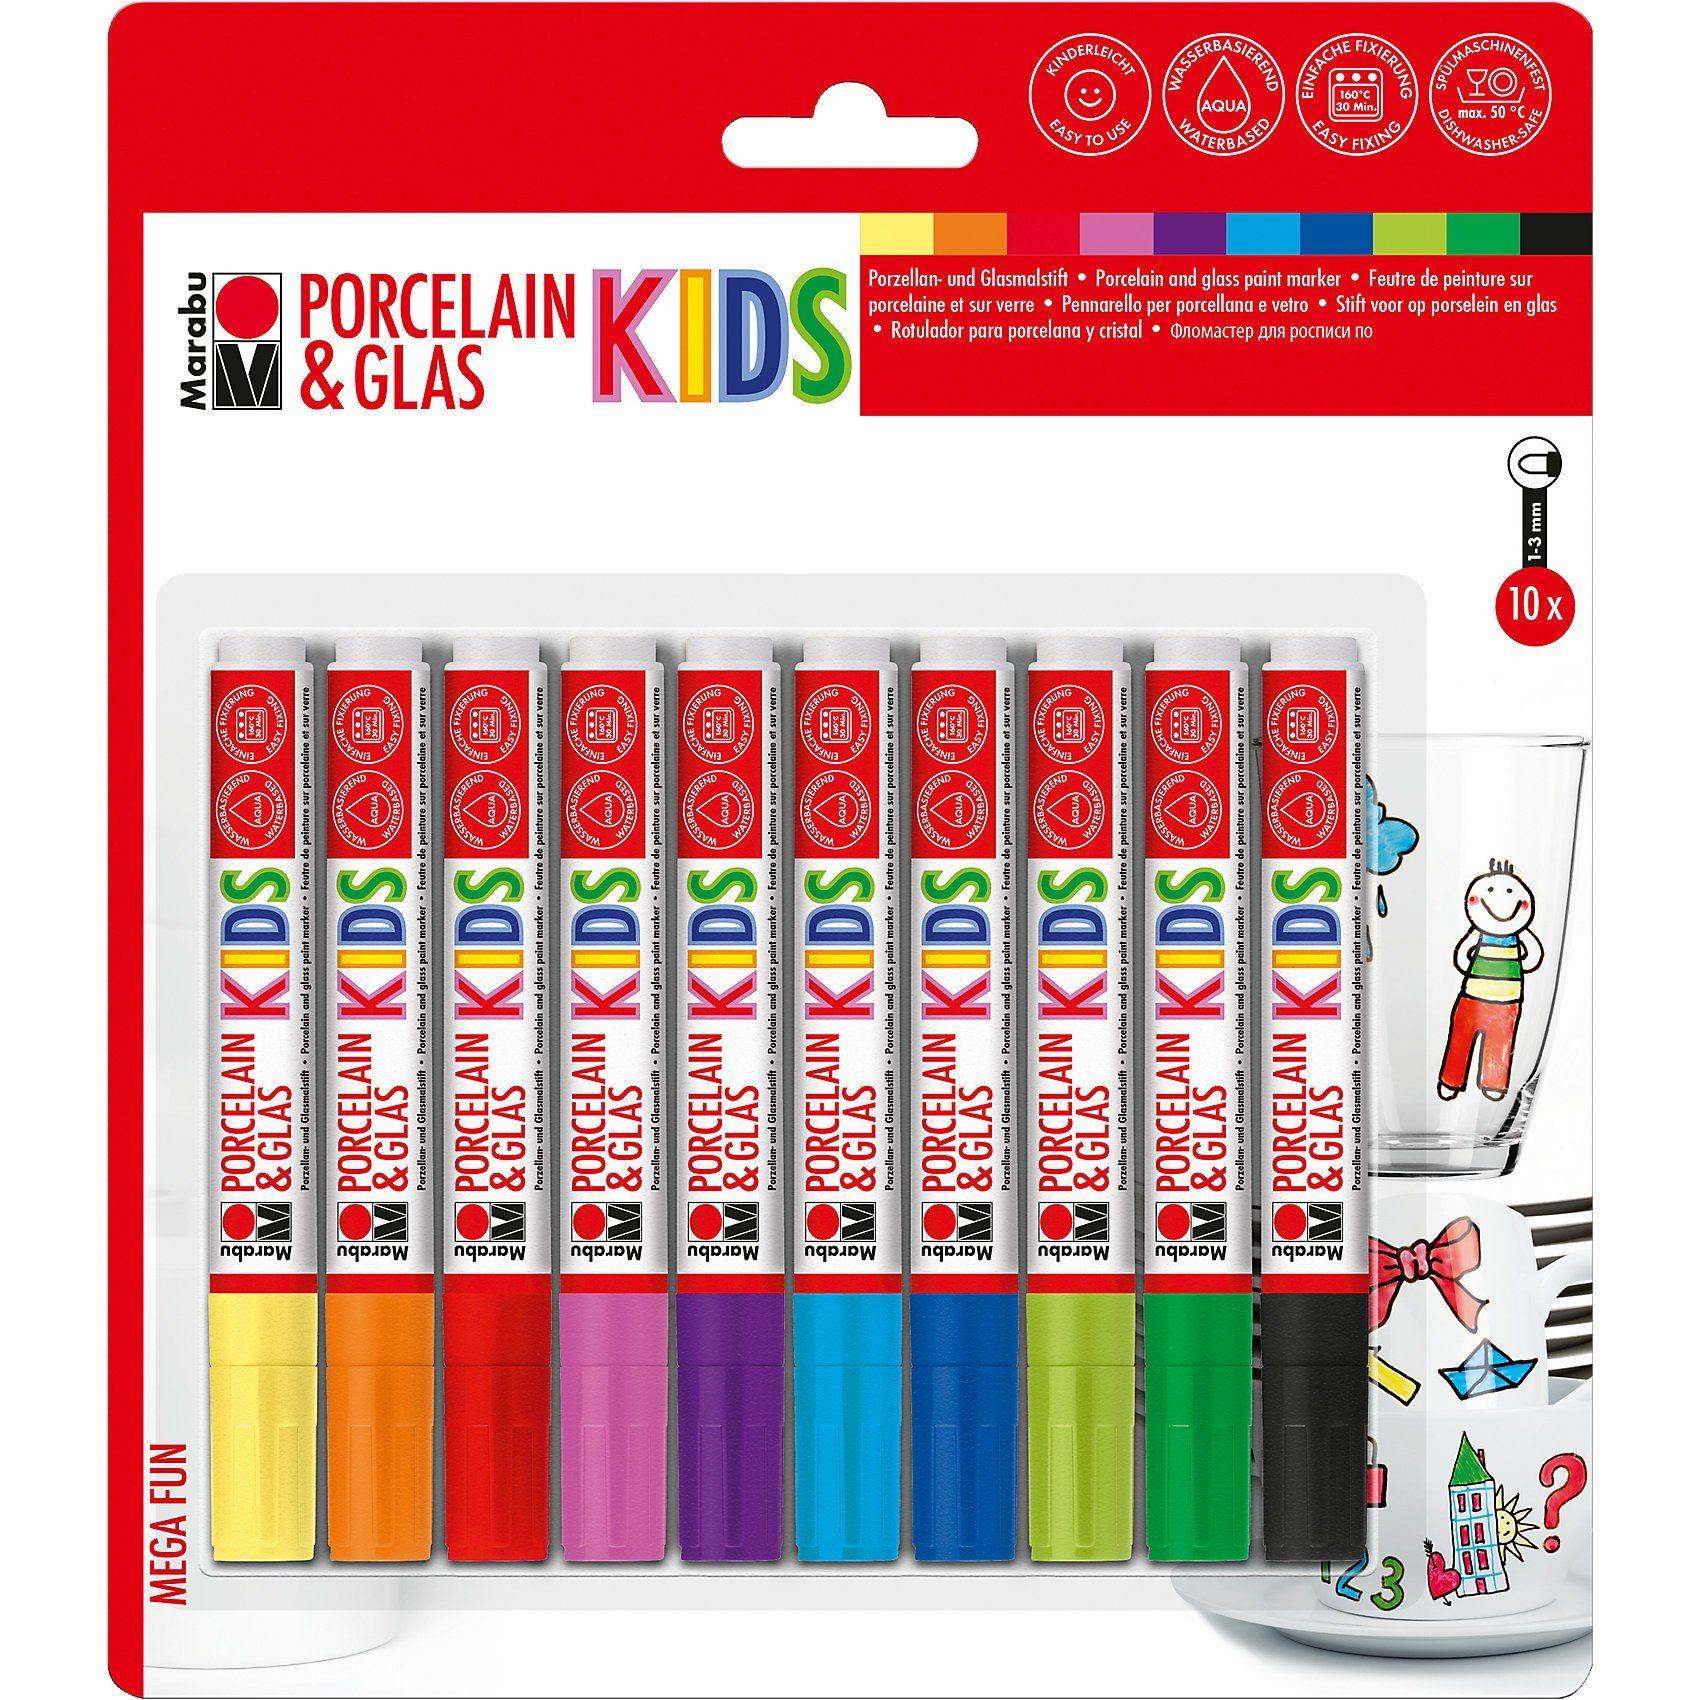 "Marabu Porzellan- & Glasmalstifte Kids ""Mega Fun"", 10 Stück"